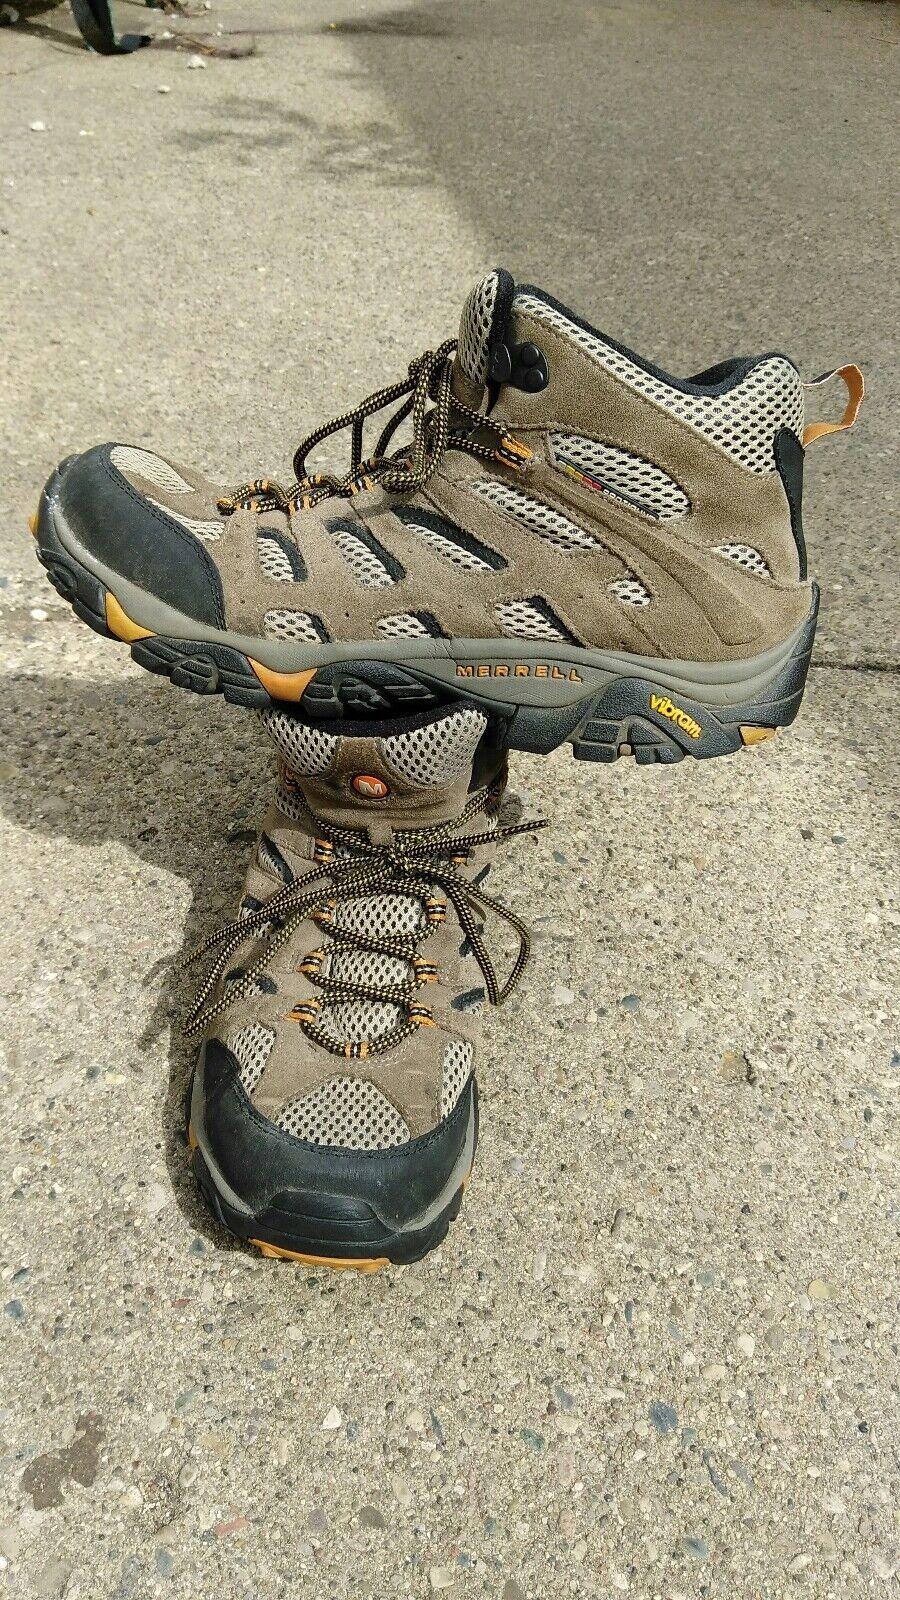 Gentleman/Lady Merrell International vibram men boots Not so expensive International Merrell choice have fun 46aed6